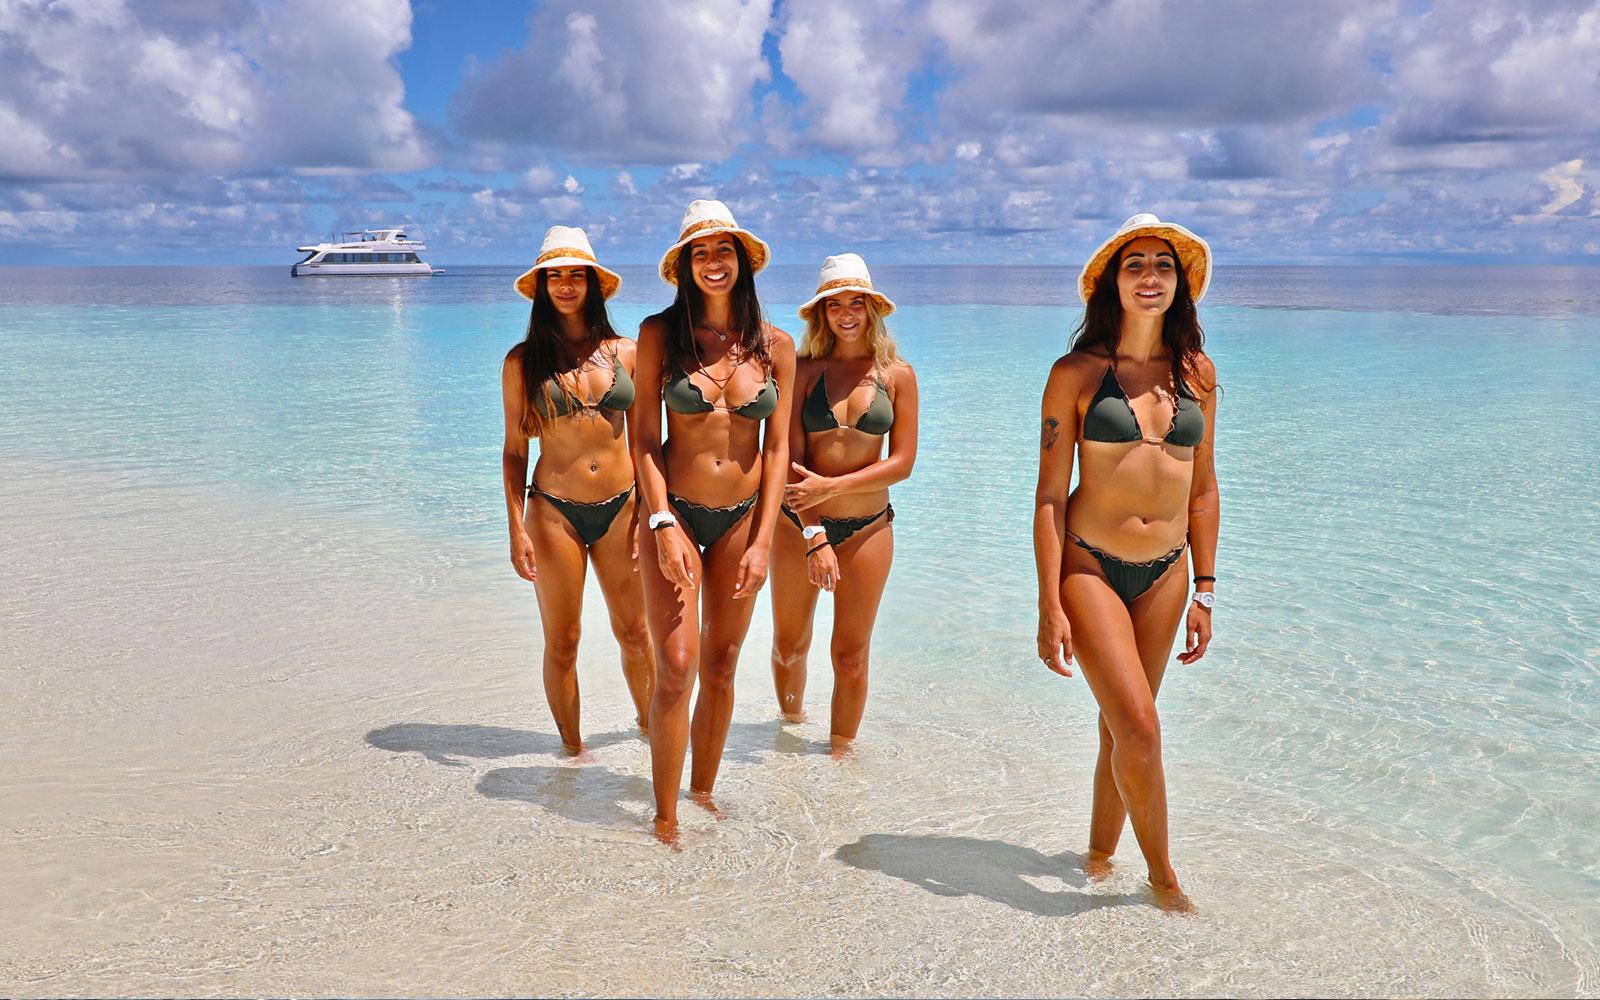 Maldive_271119_1447.jpg